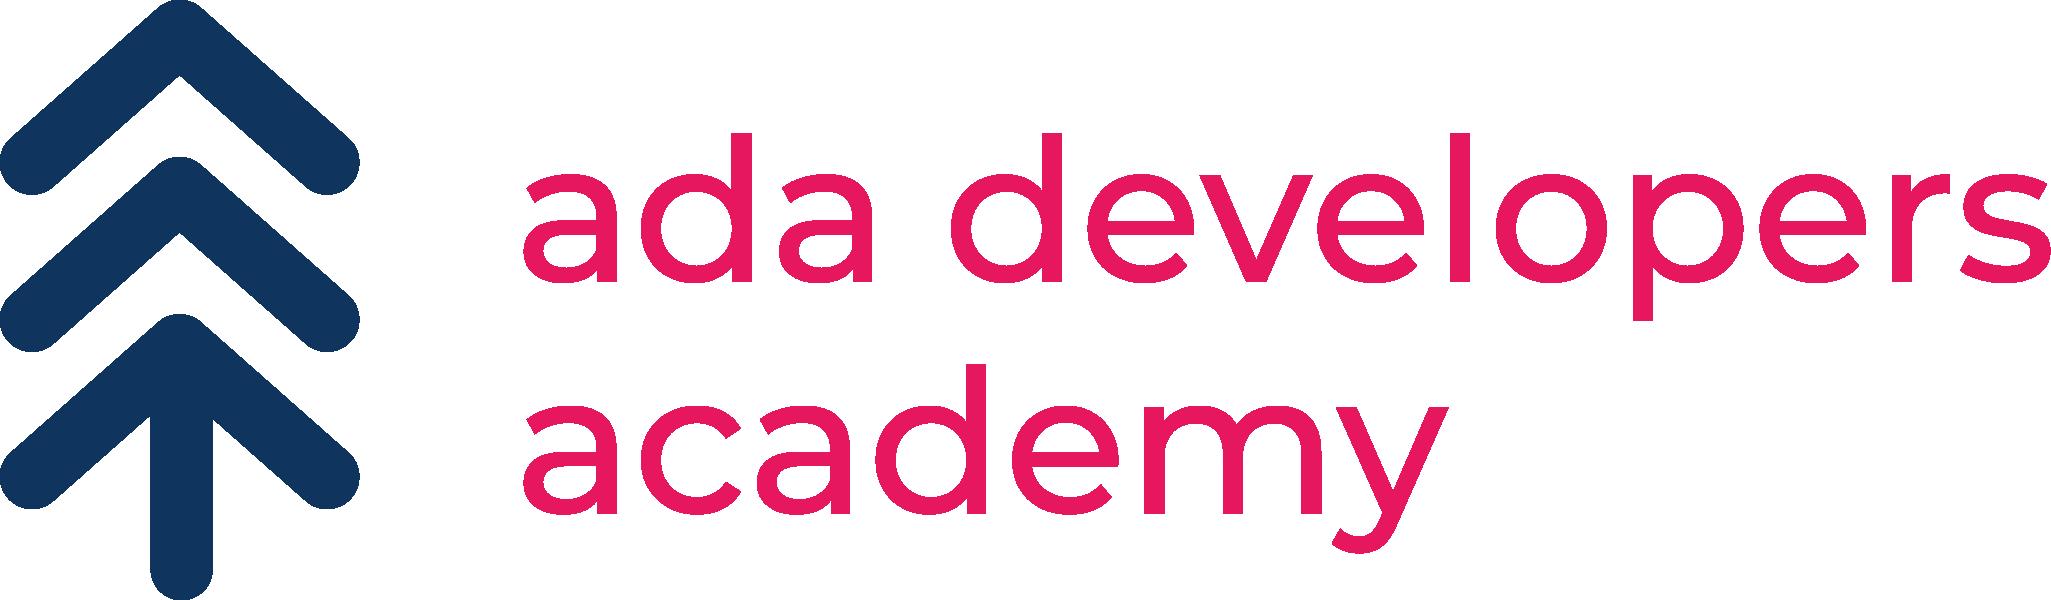 Ada Developers Academy logo